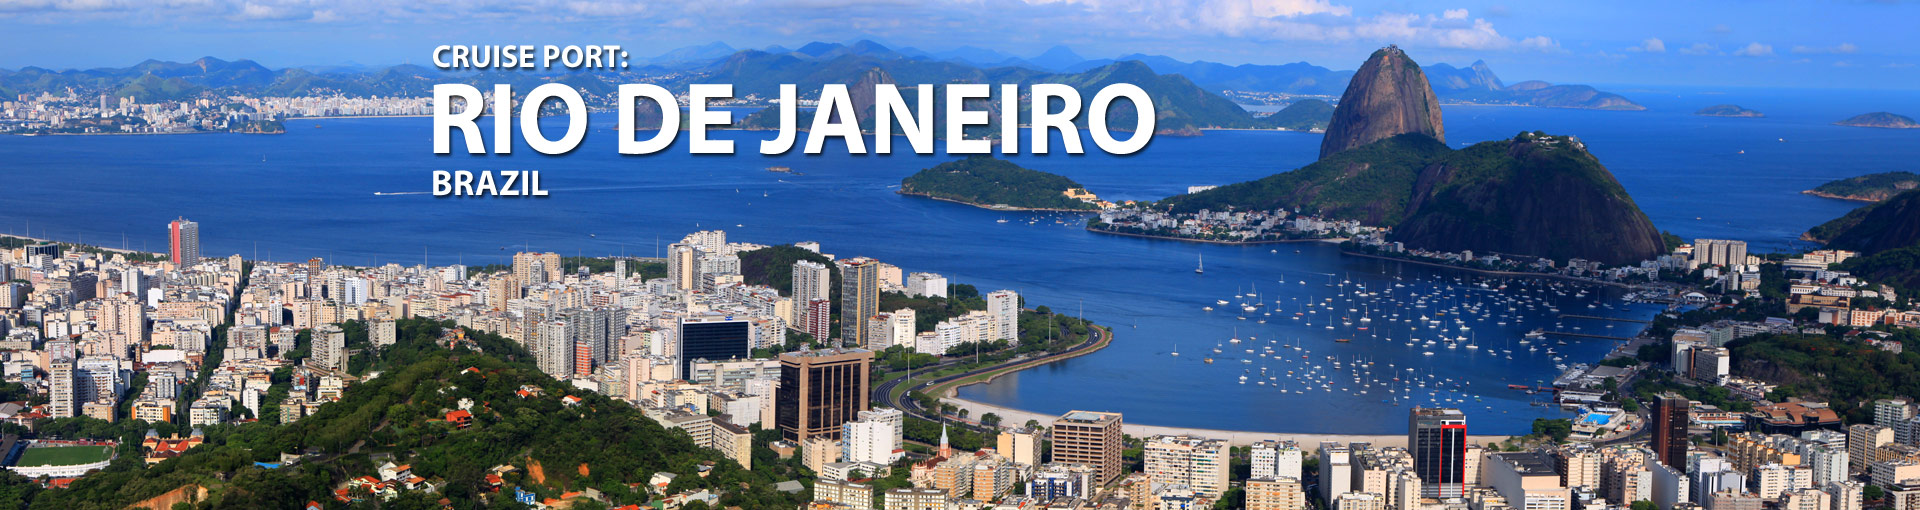 Rio De Janeiro Brazil Cruise Port 2017 And 2018 Cruises